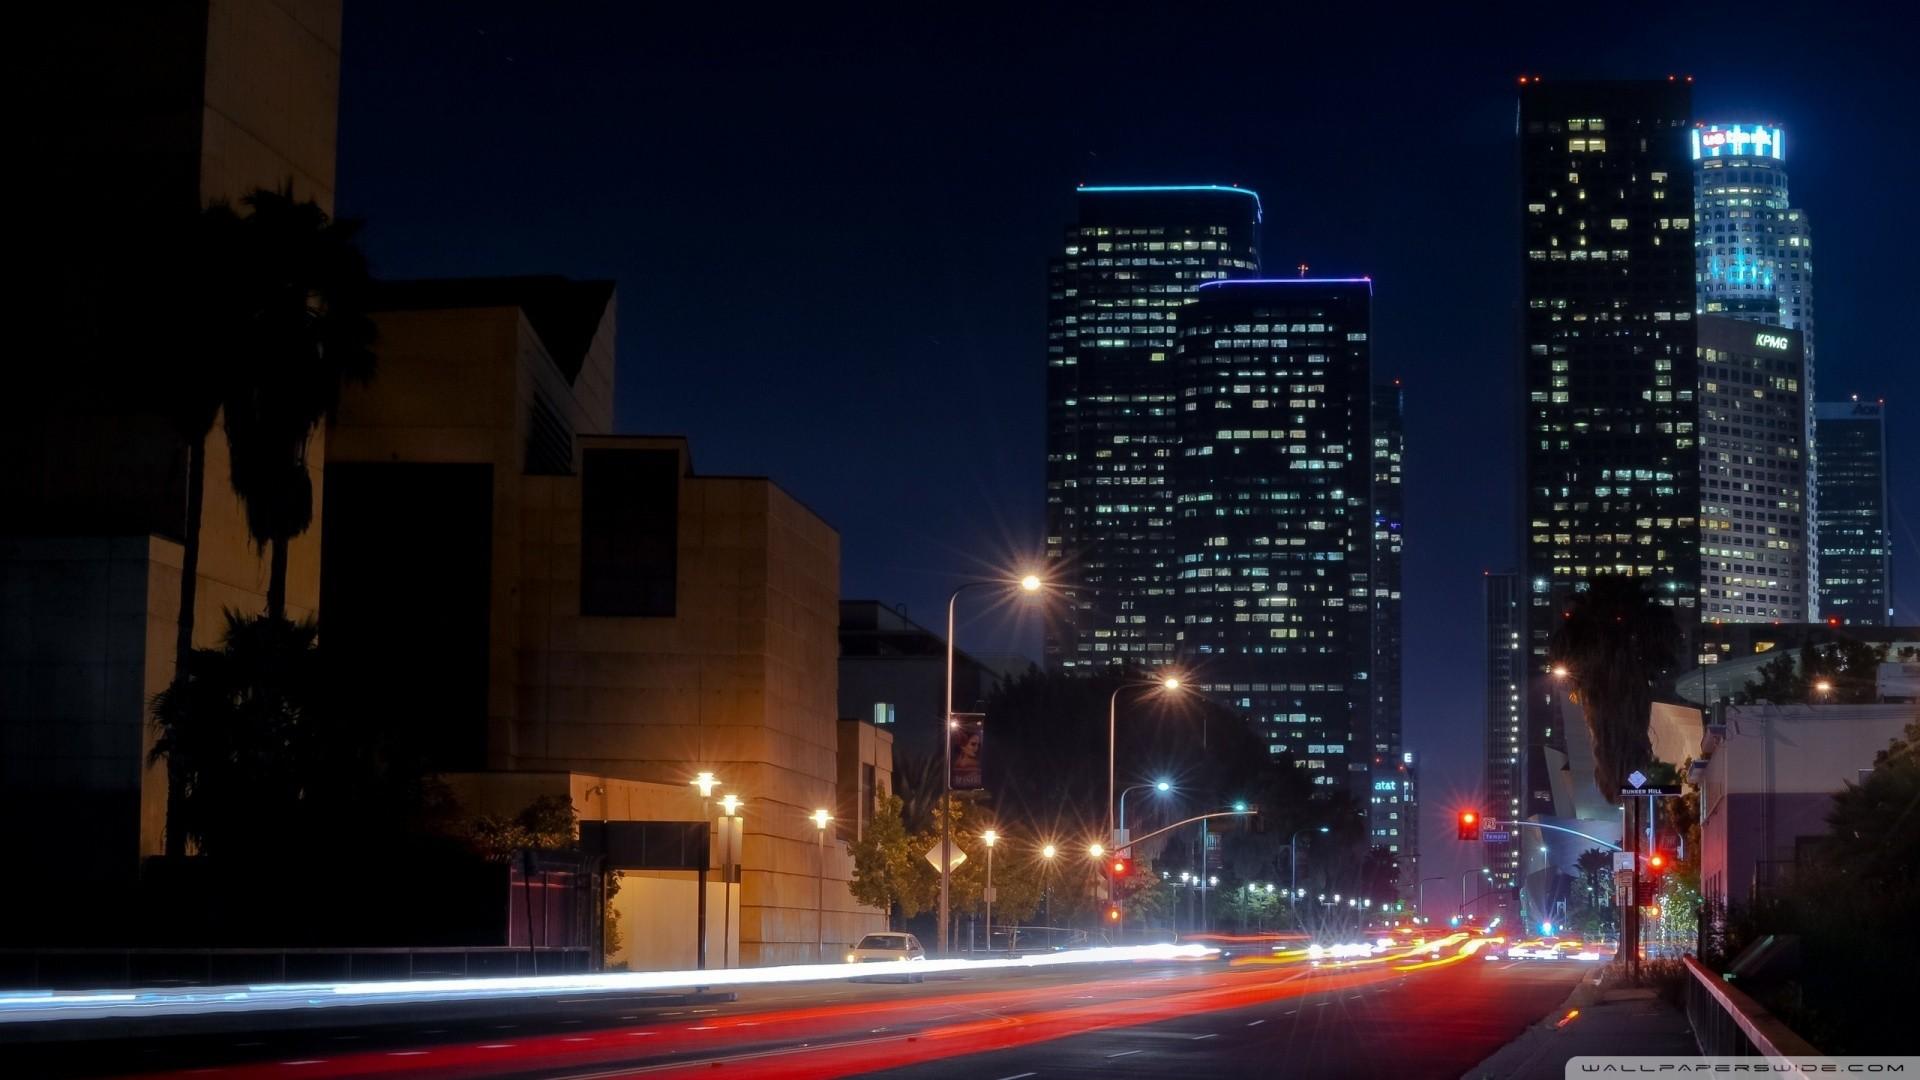 Los Angeles Street Hd Desktop Wallpaper High Definition